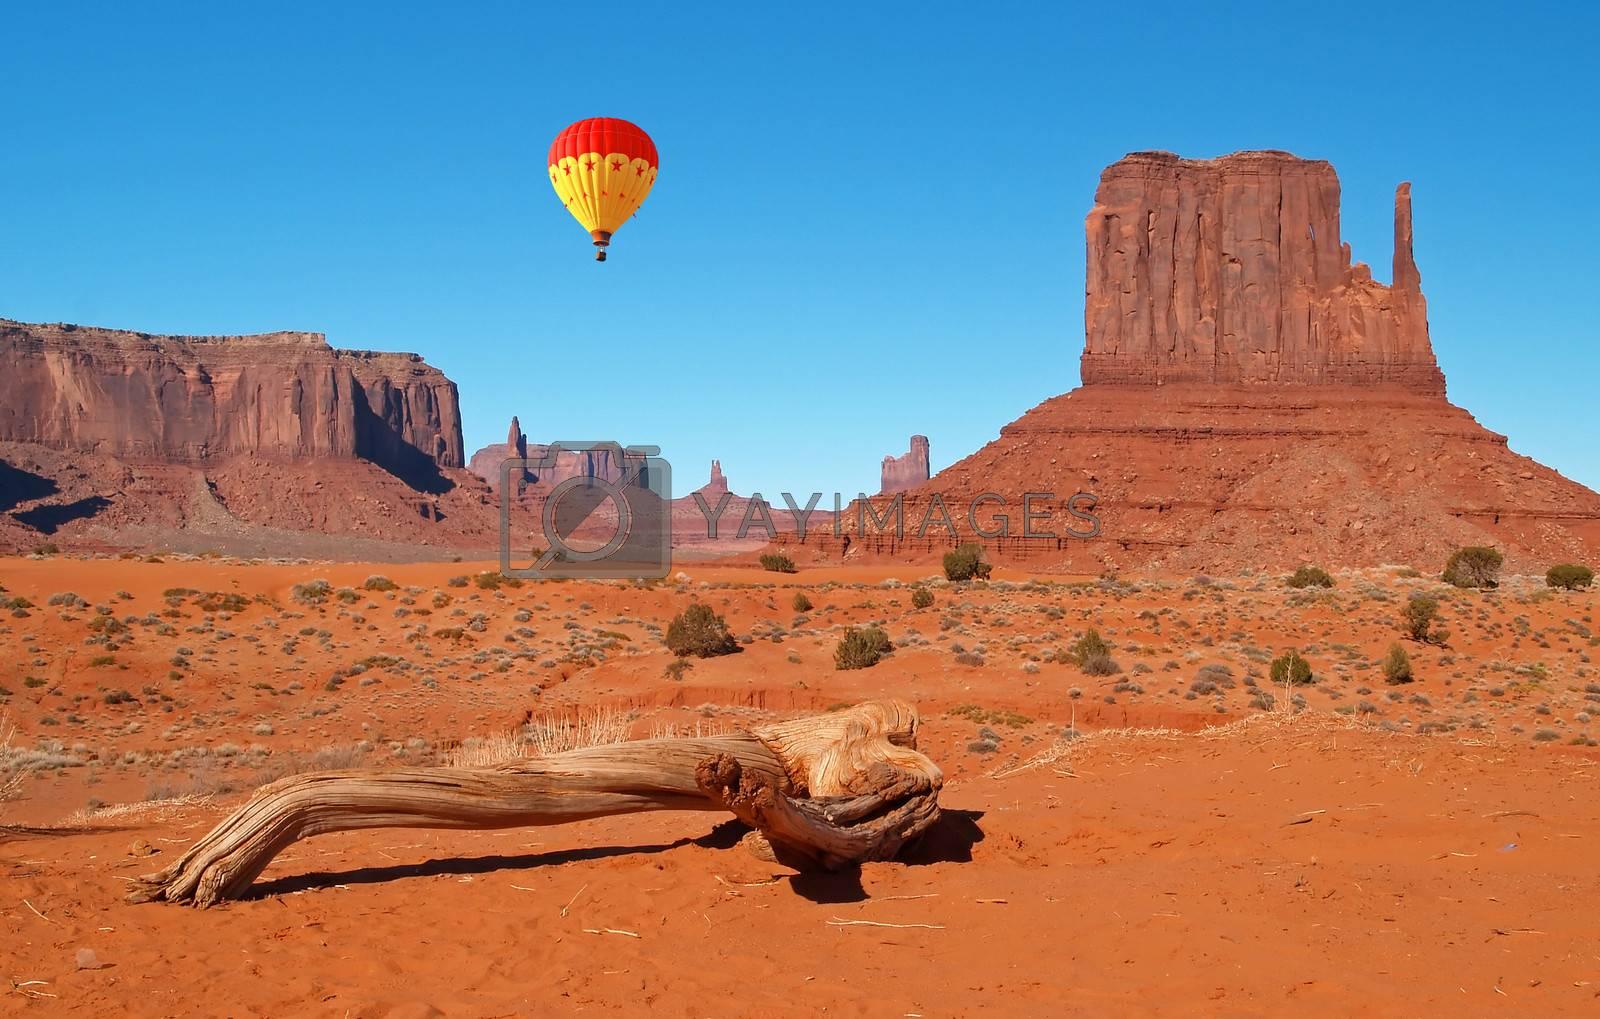 Monument Valley Navajo Tribal Park in Utah